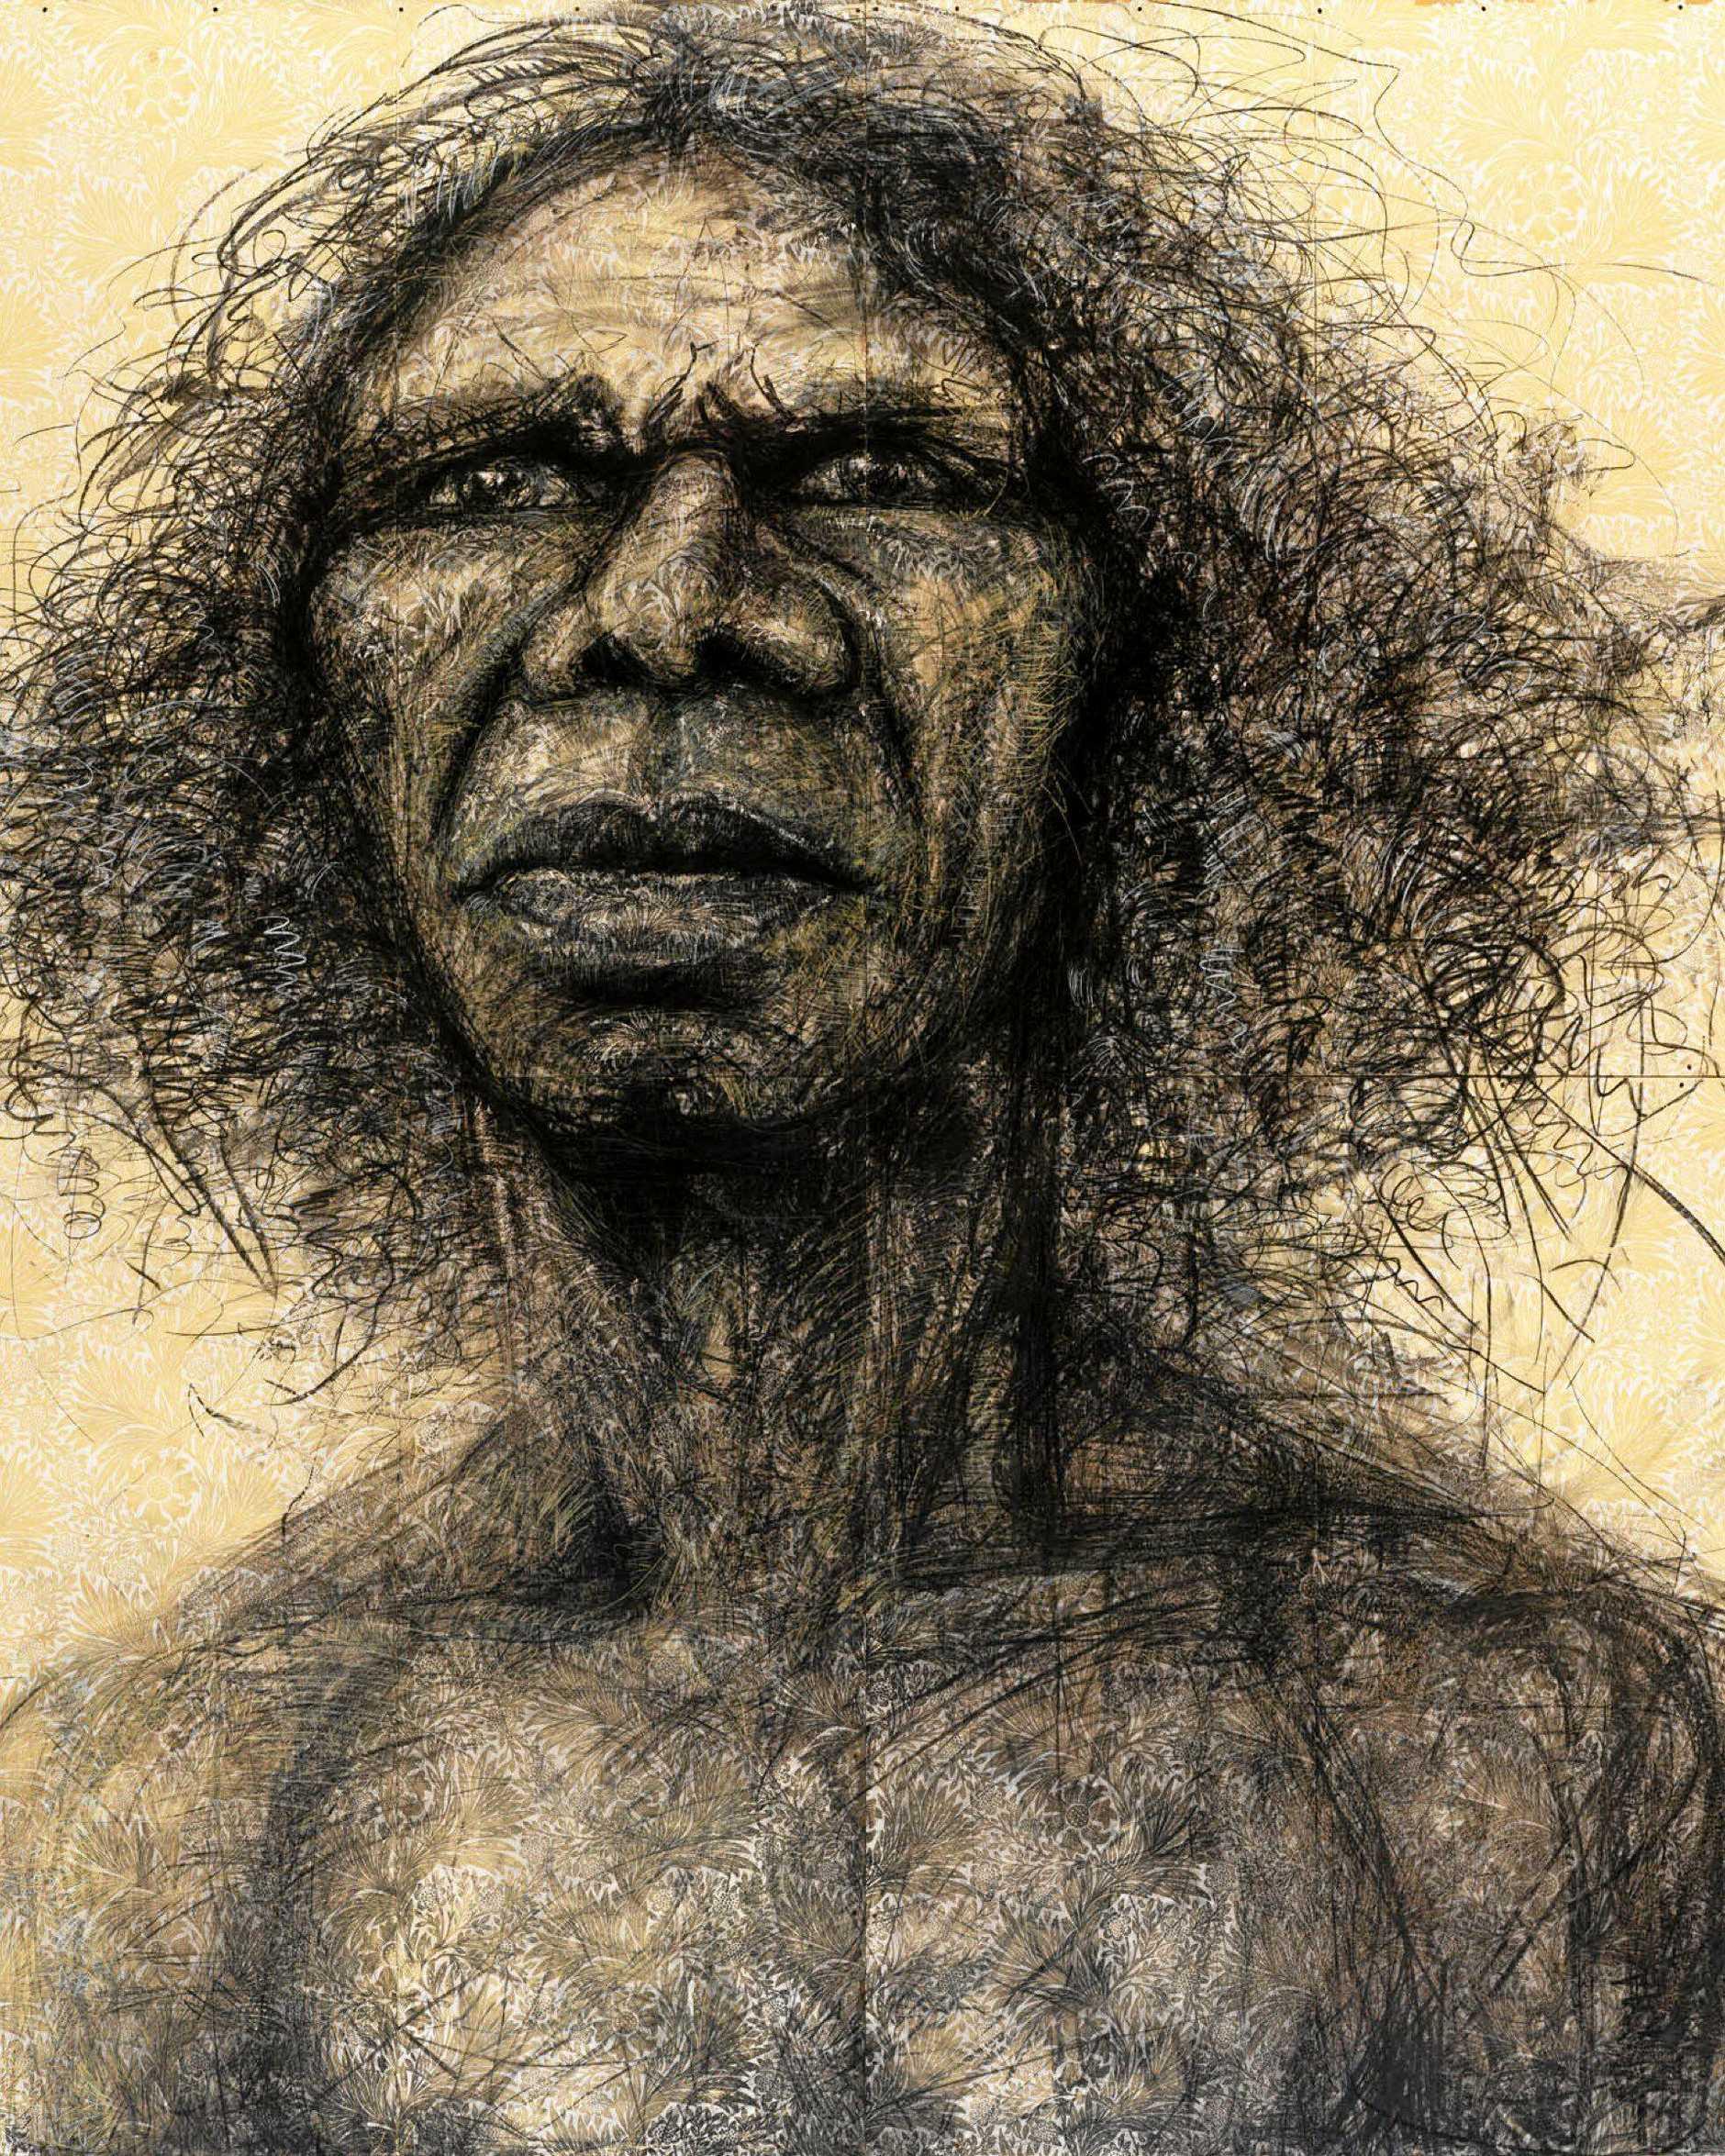 ARTWORK: Craig Ruddy's 2004 Archibald Prize and People Choice-winning artwork, Two Worlds, a portrait of Yolngu traditional dancer and actor David Gulpilil Ridjimiraril Dalaithngu AM..